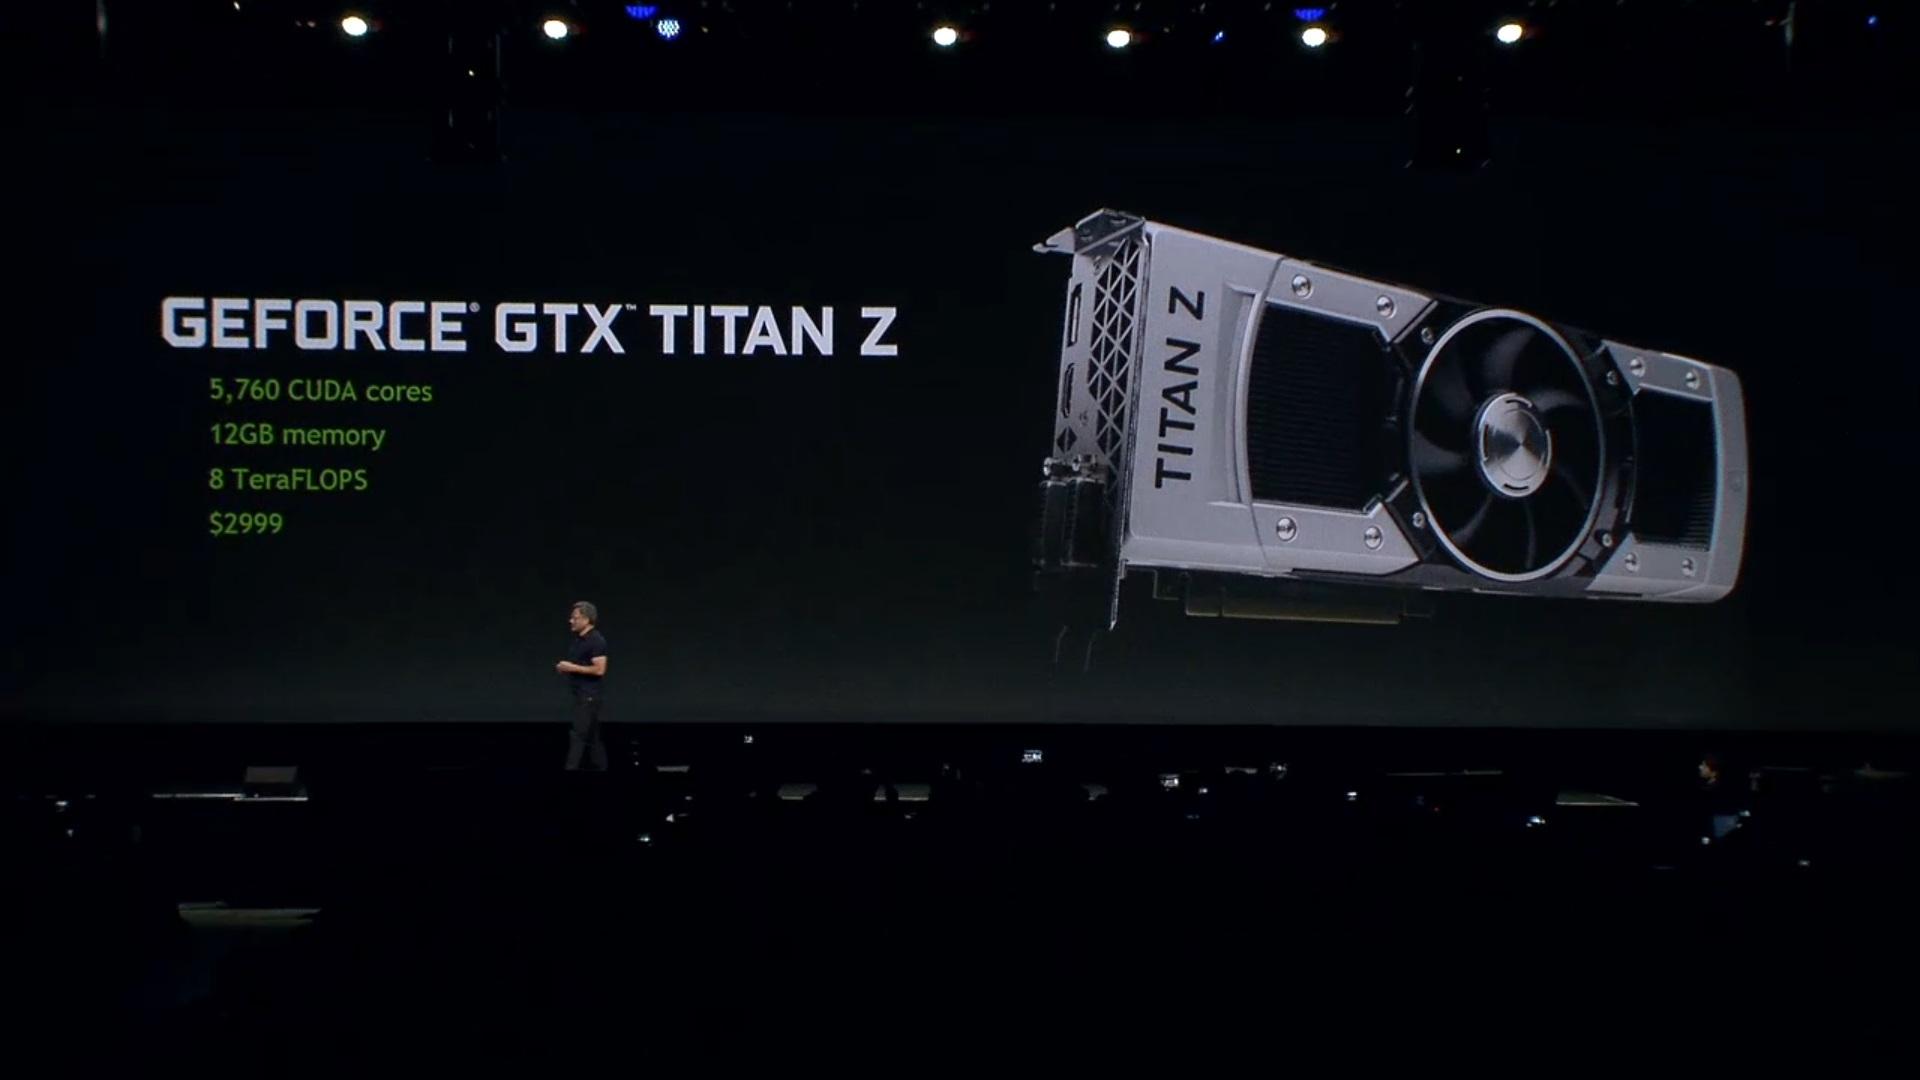 titan_z0iekm.jpg